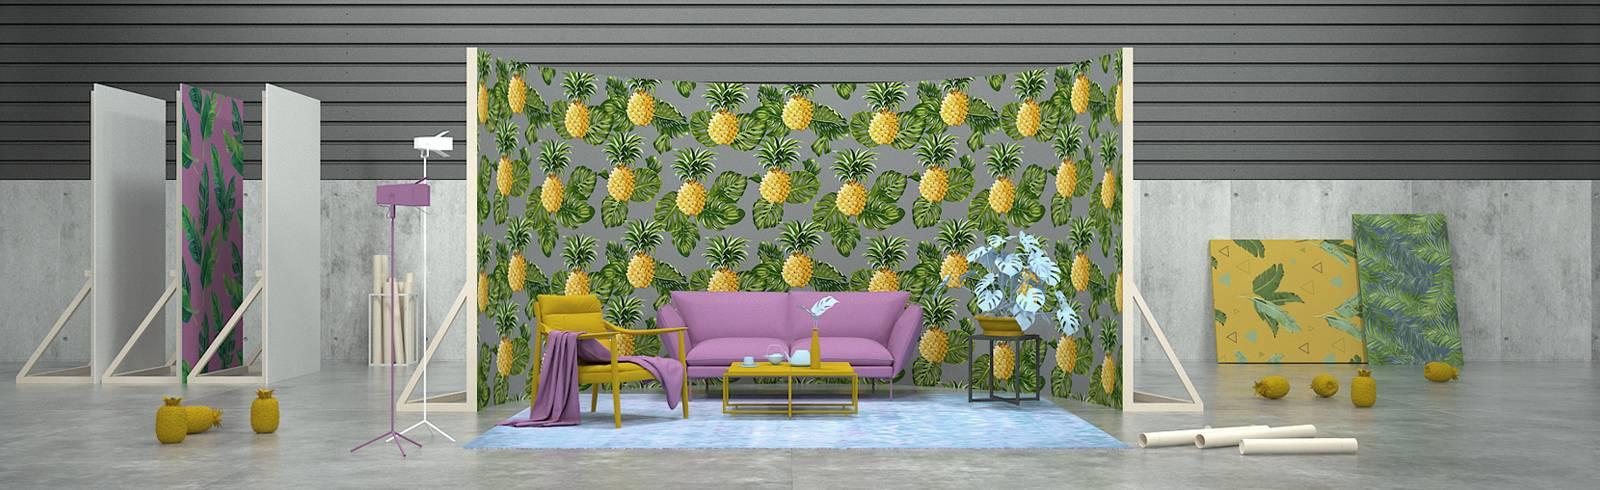 Nálepky - Keep Warm, it's a Pineapple